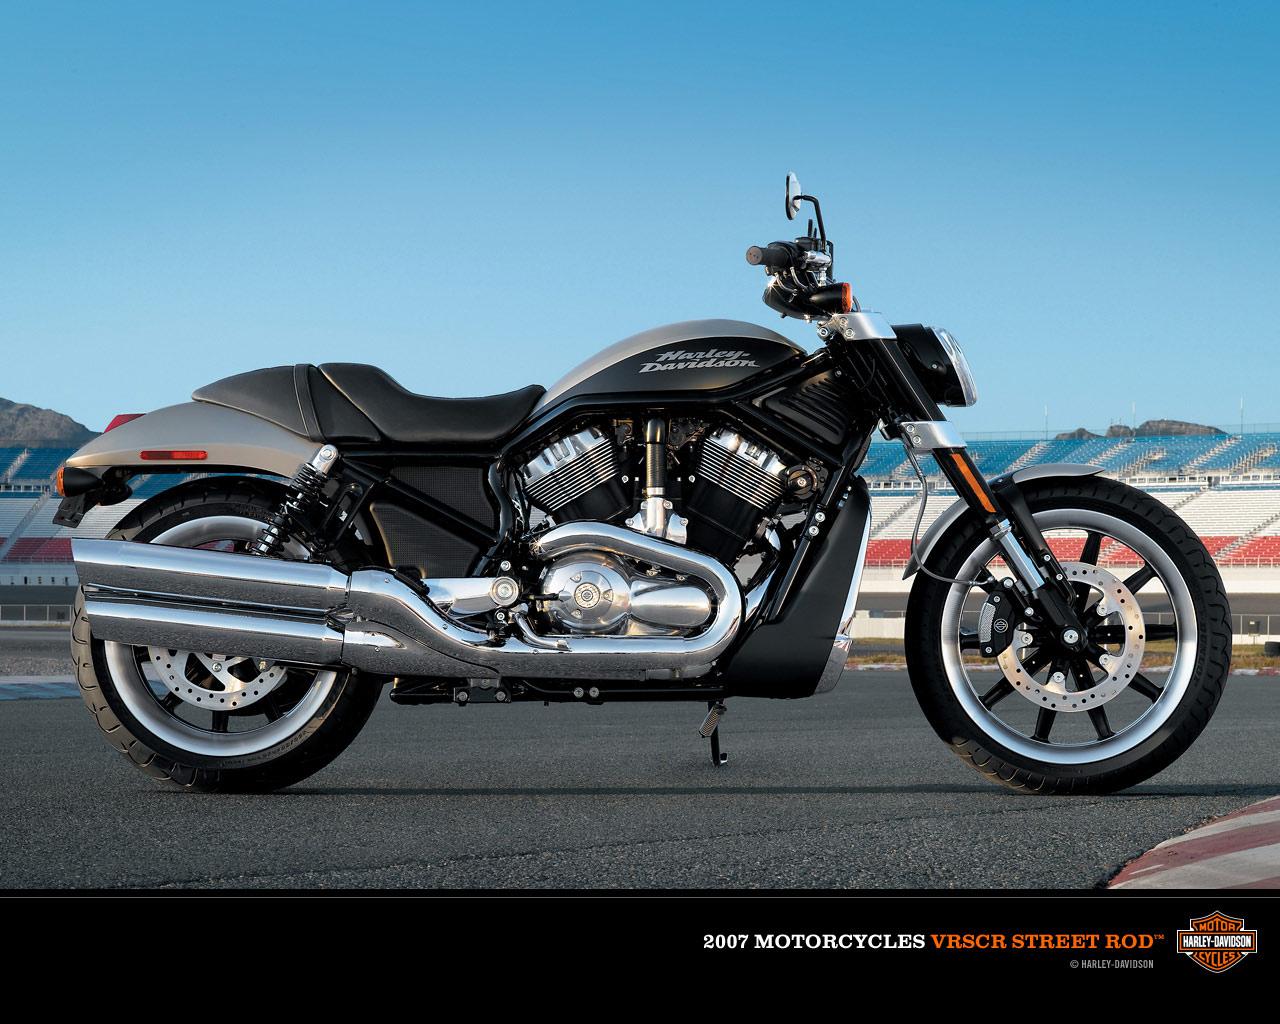 http://3.bp.blogspot.com/-83M2NDtfEaw/TXYYiVJp7pI/AAAAAAAAJoc/_xfW5QNY7VQ/s1600/Harley-Davidson_VRSCR_Street_Rod%2525252525252C_2007_bike_wallpaper.jpg